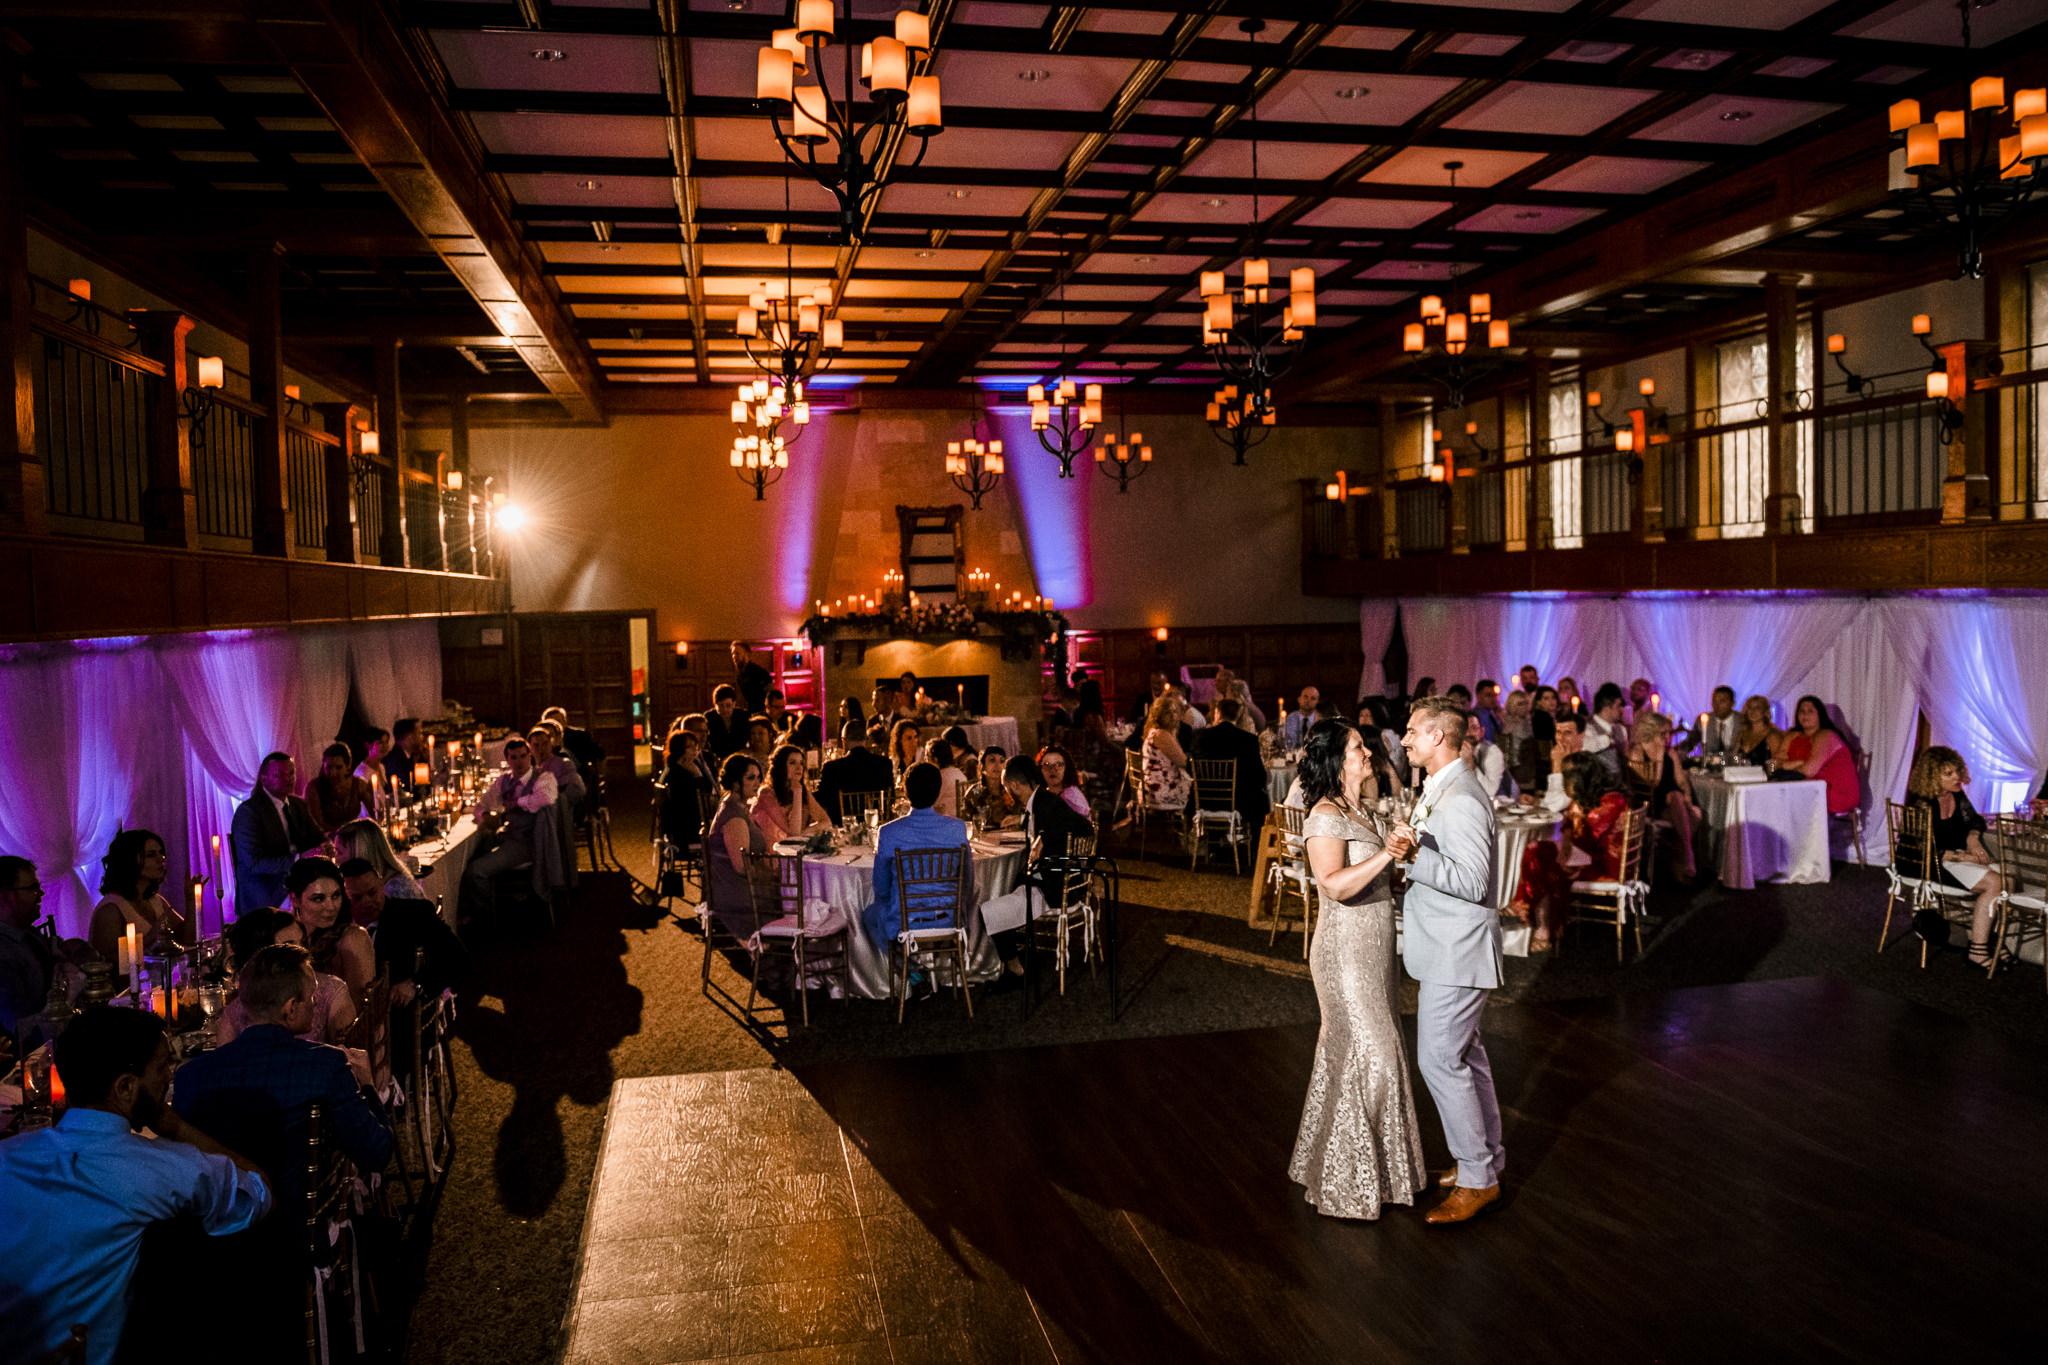 Barbato-Moorestown-Community-House-Wedding-New-Jersey-Photographer-33.JPG